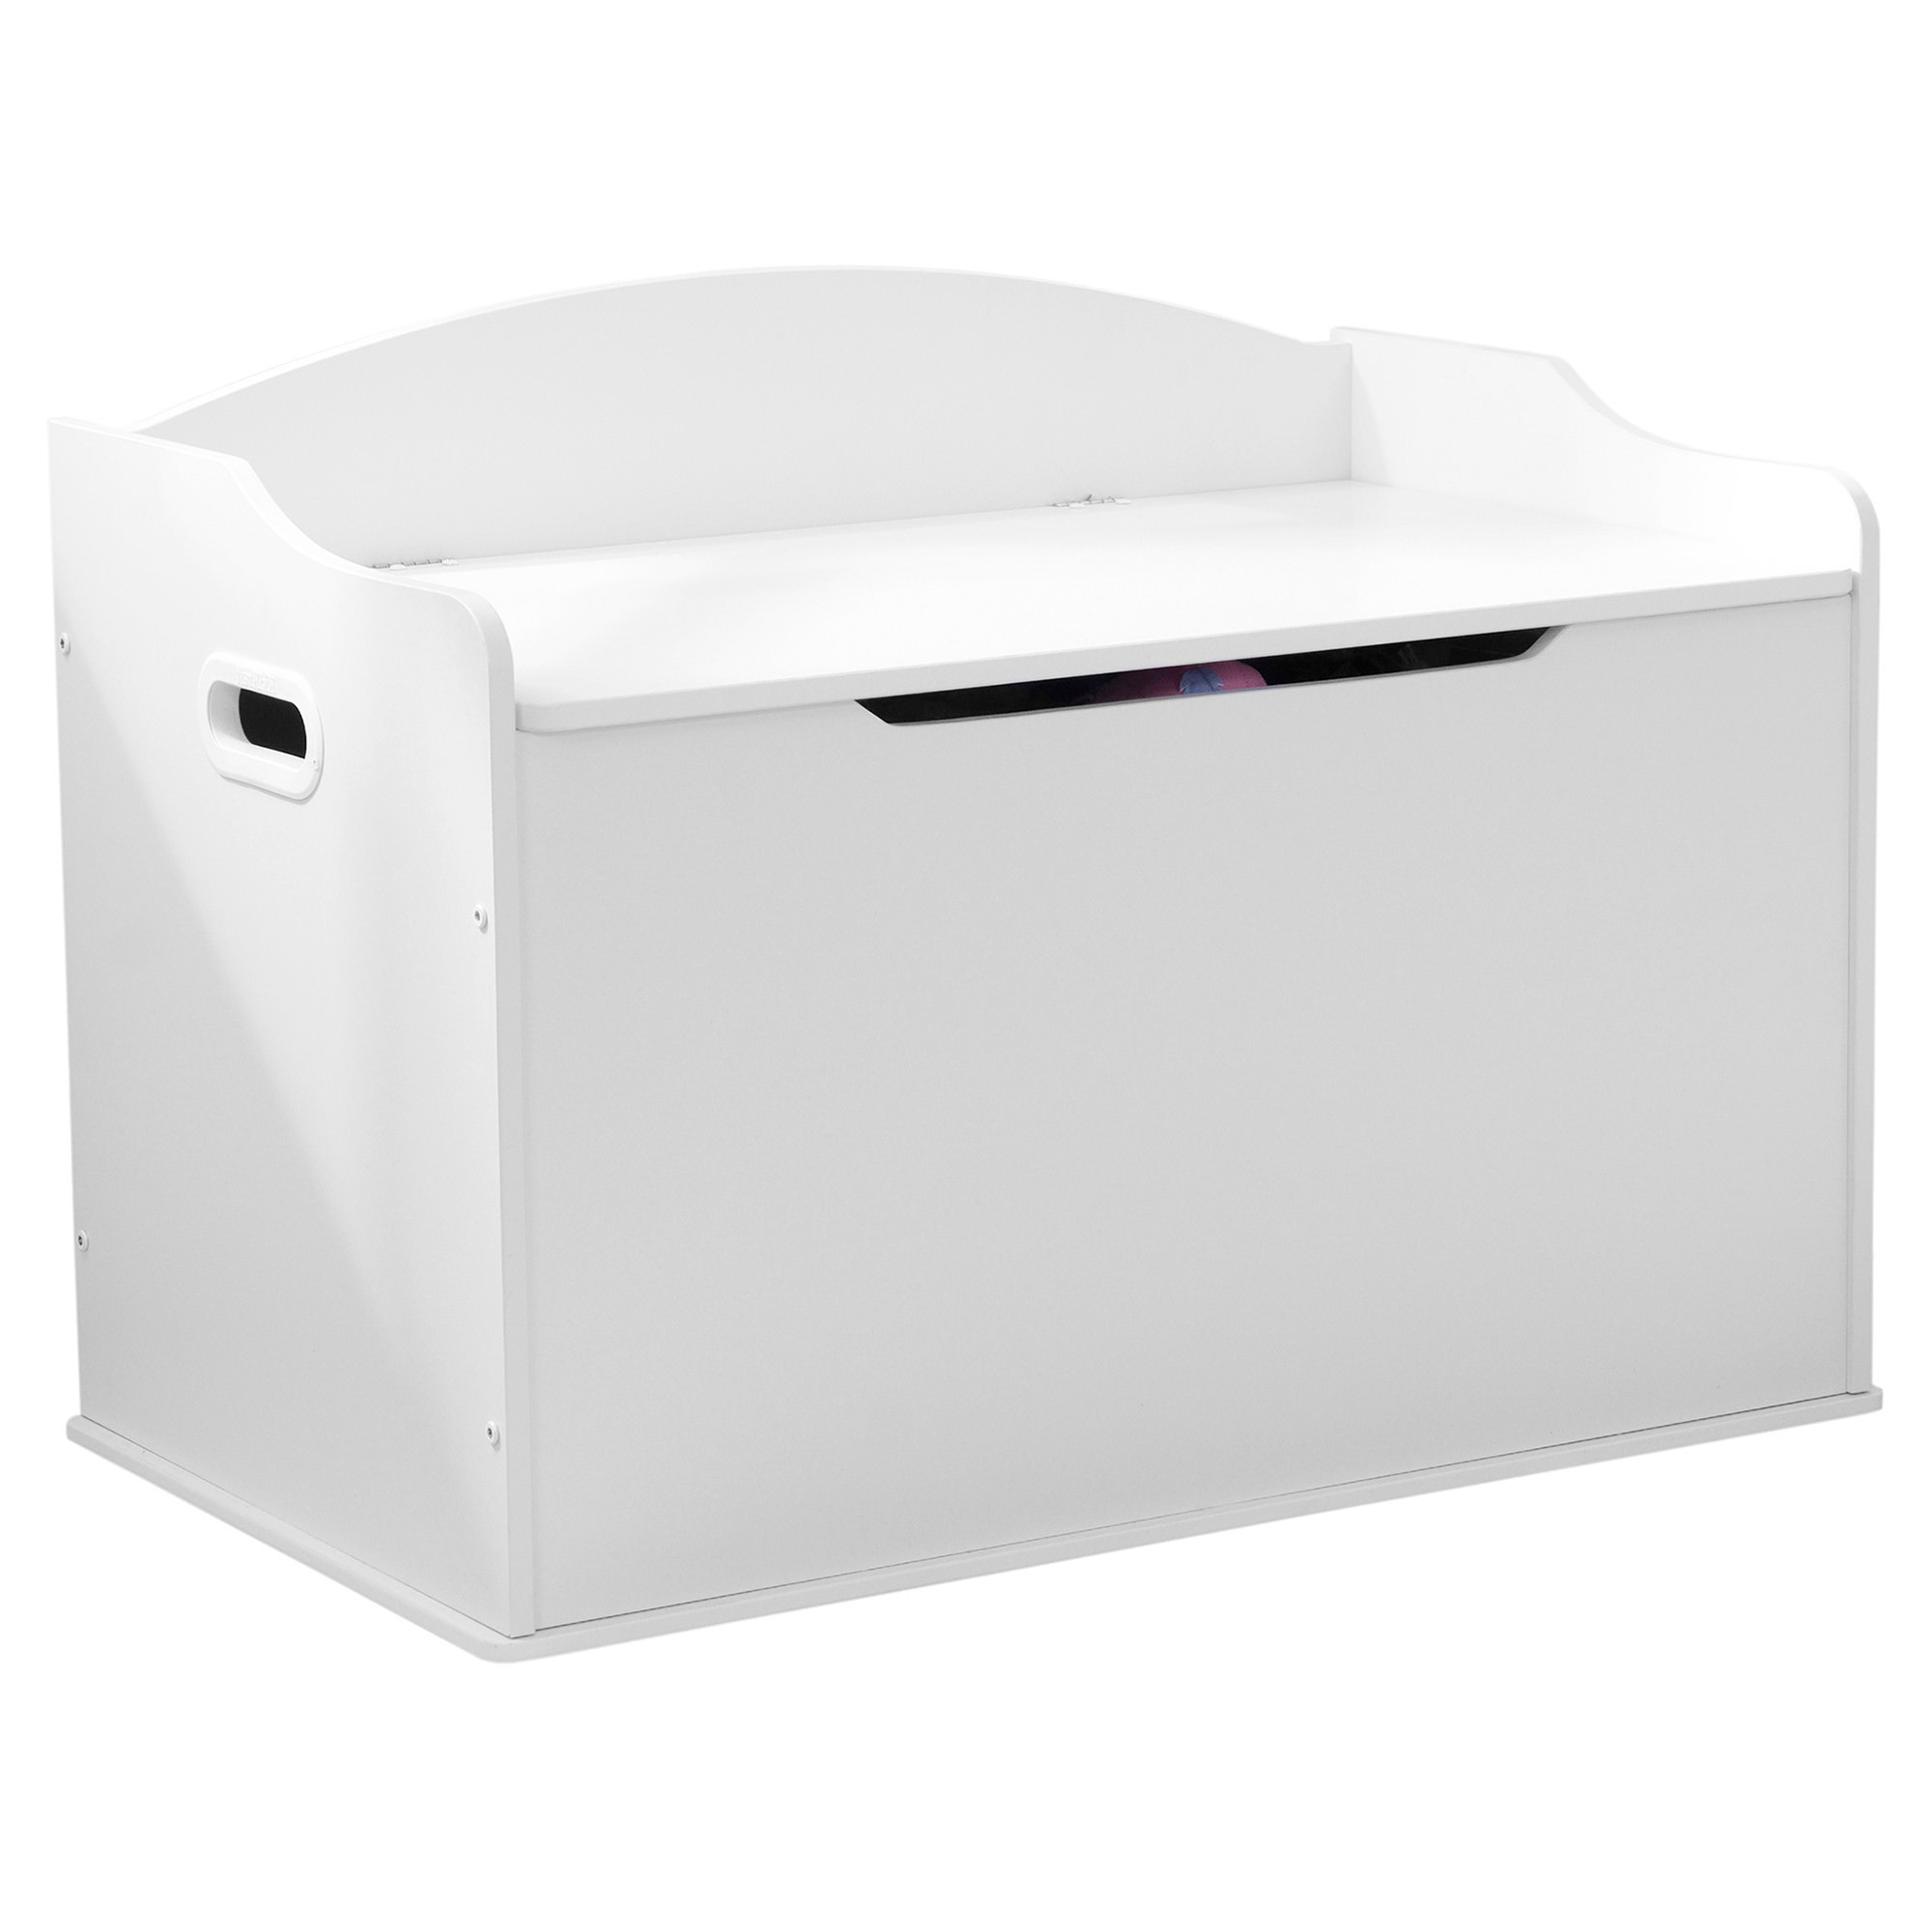 Kidkraft Austin Toy Box - White